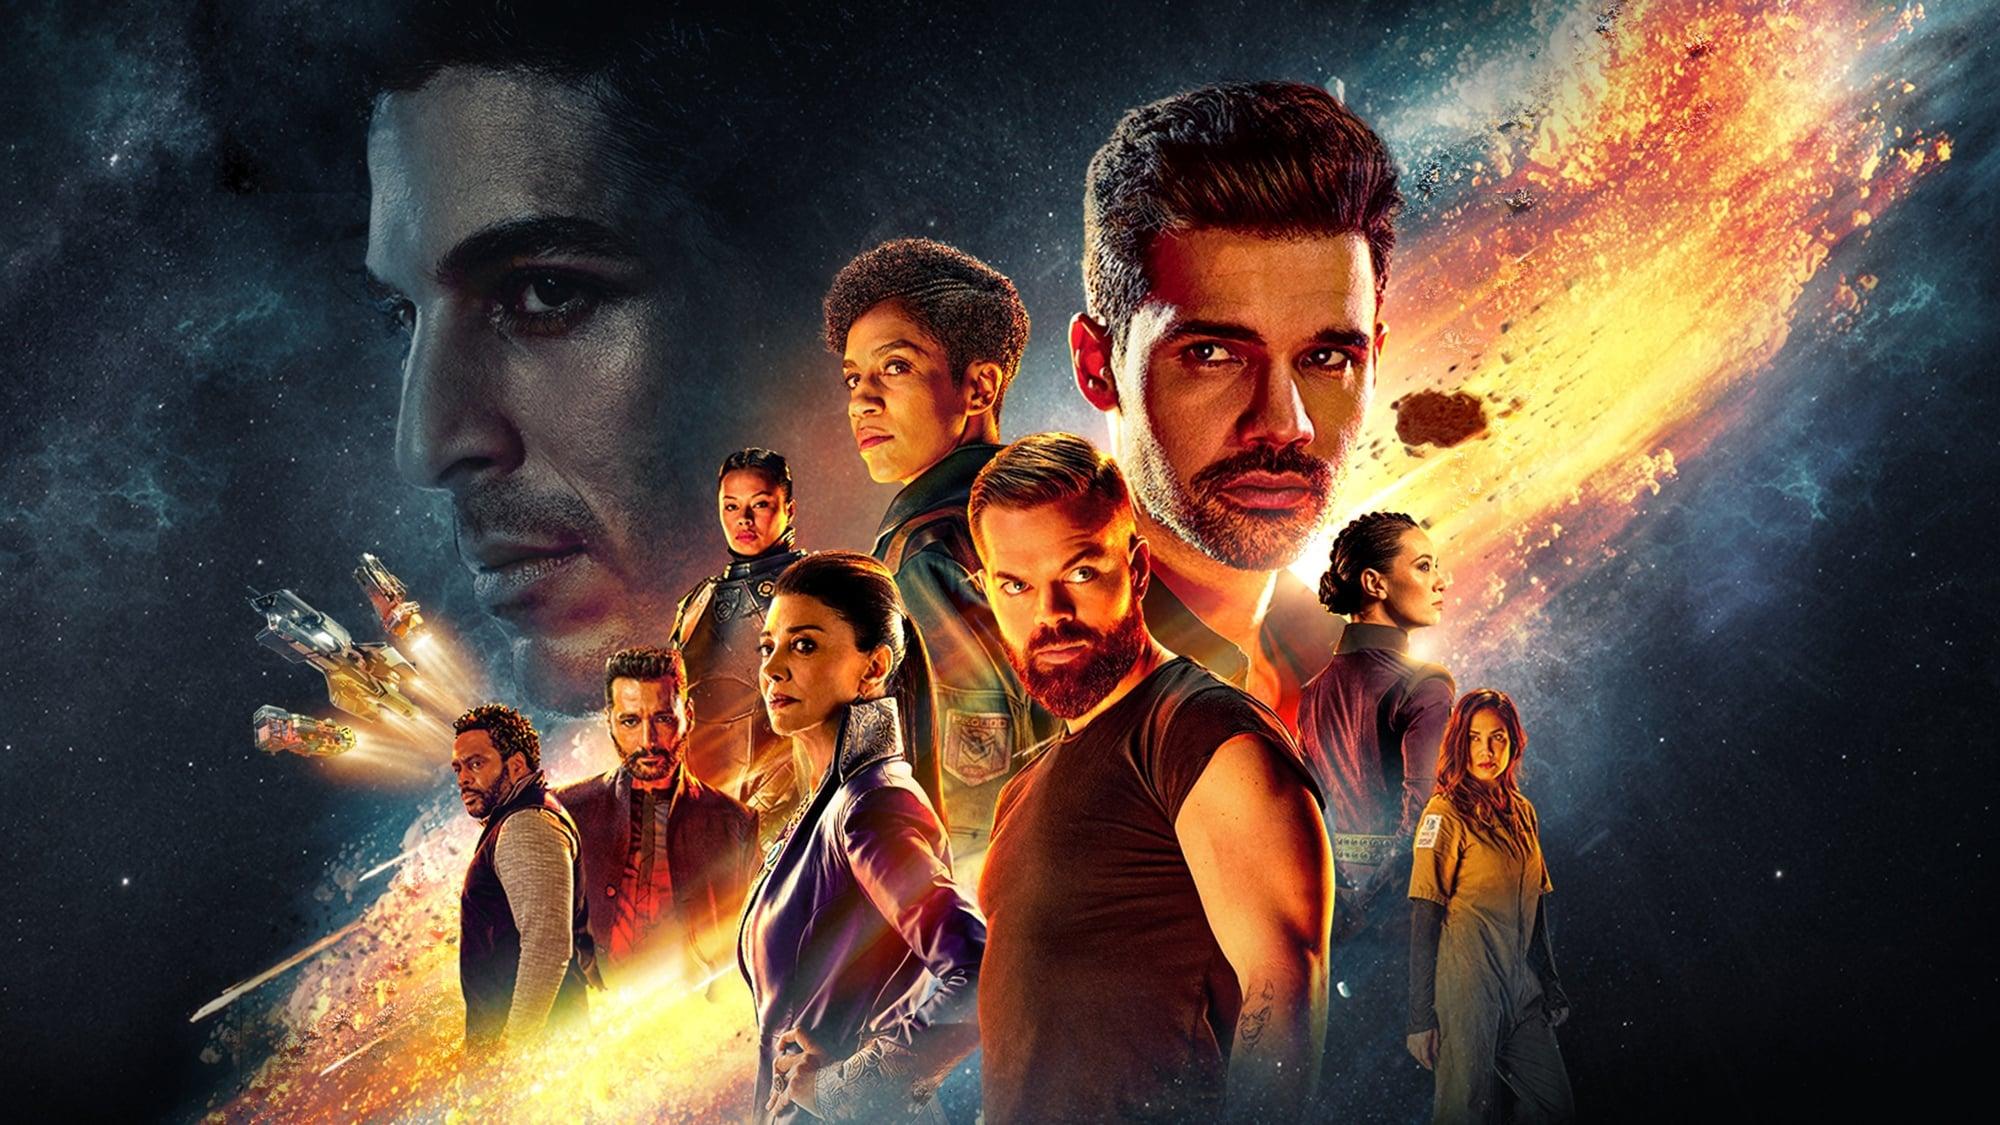 Awards: Best Sci-fi series of 2016